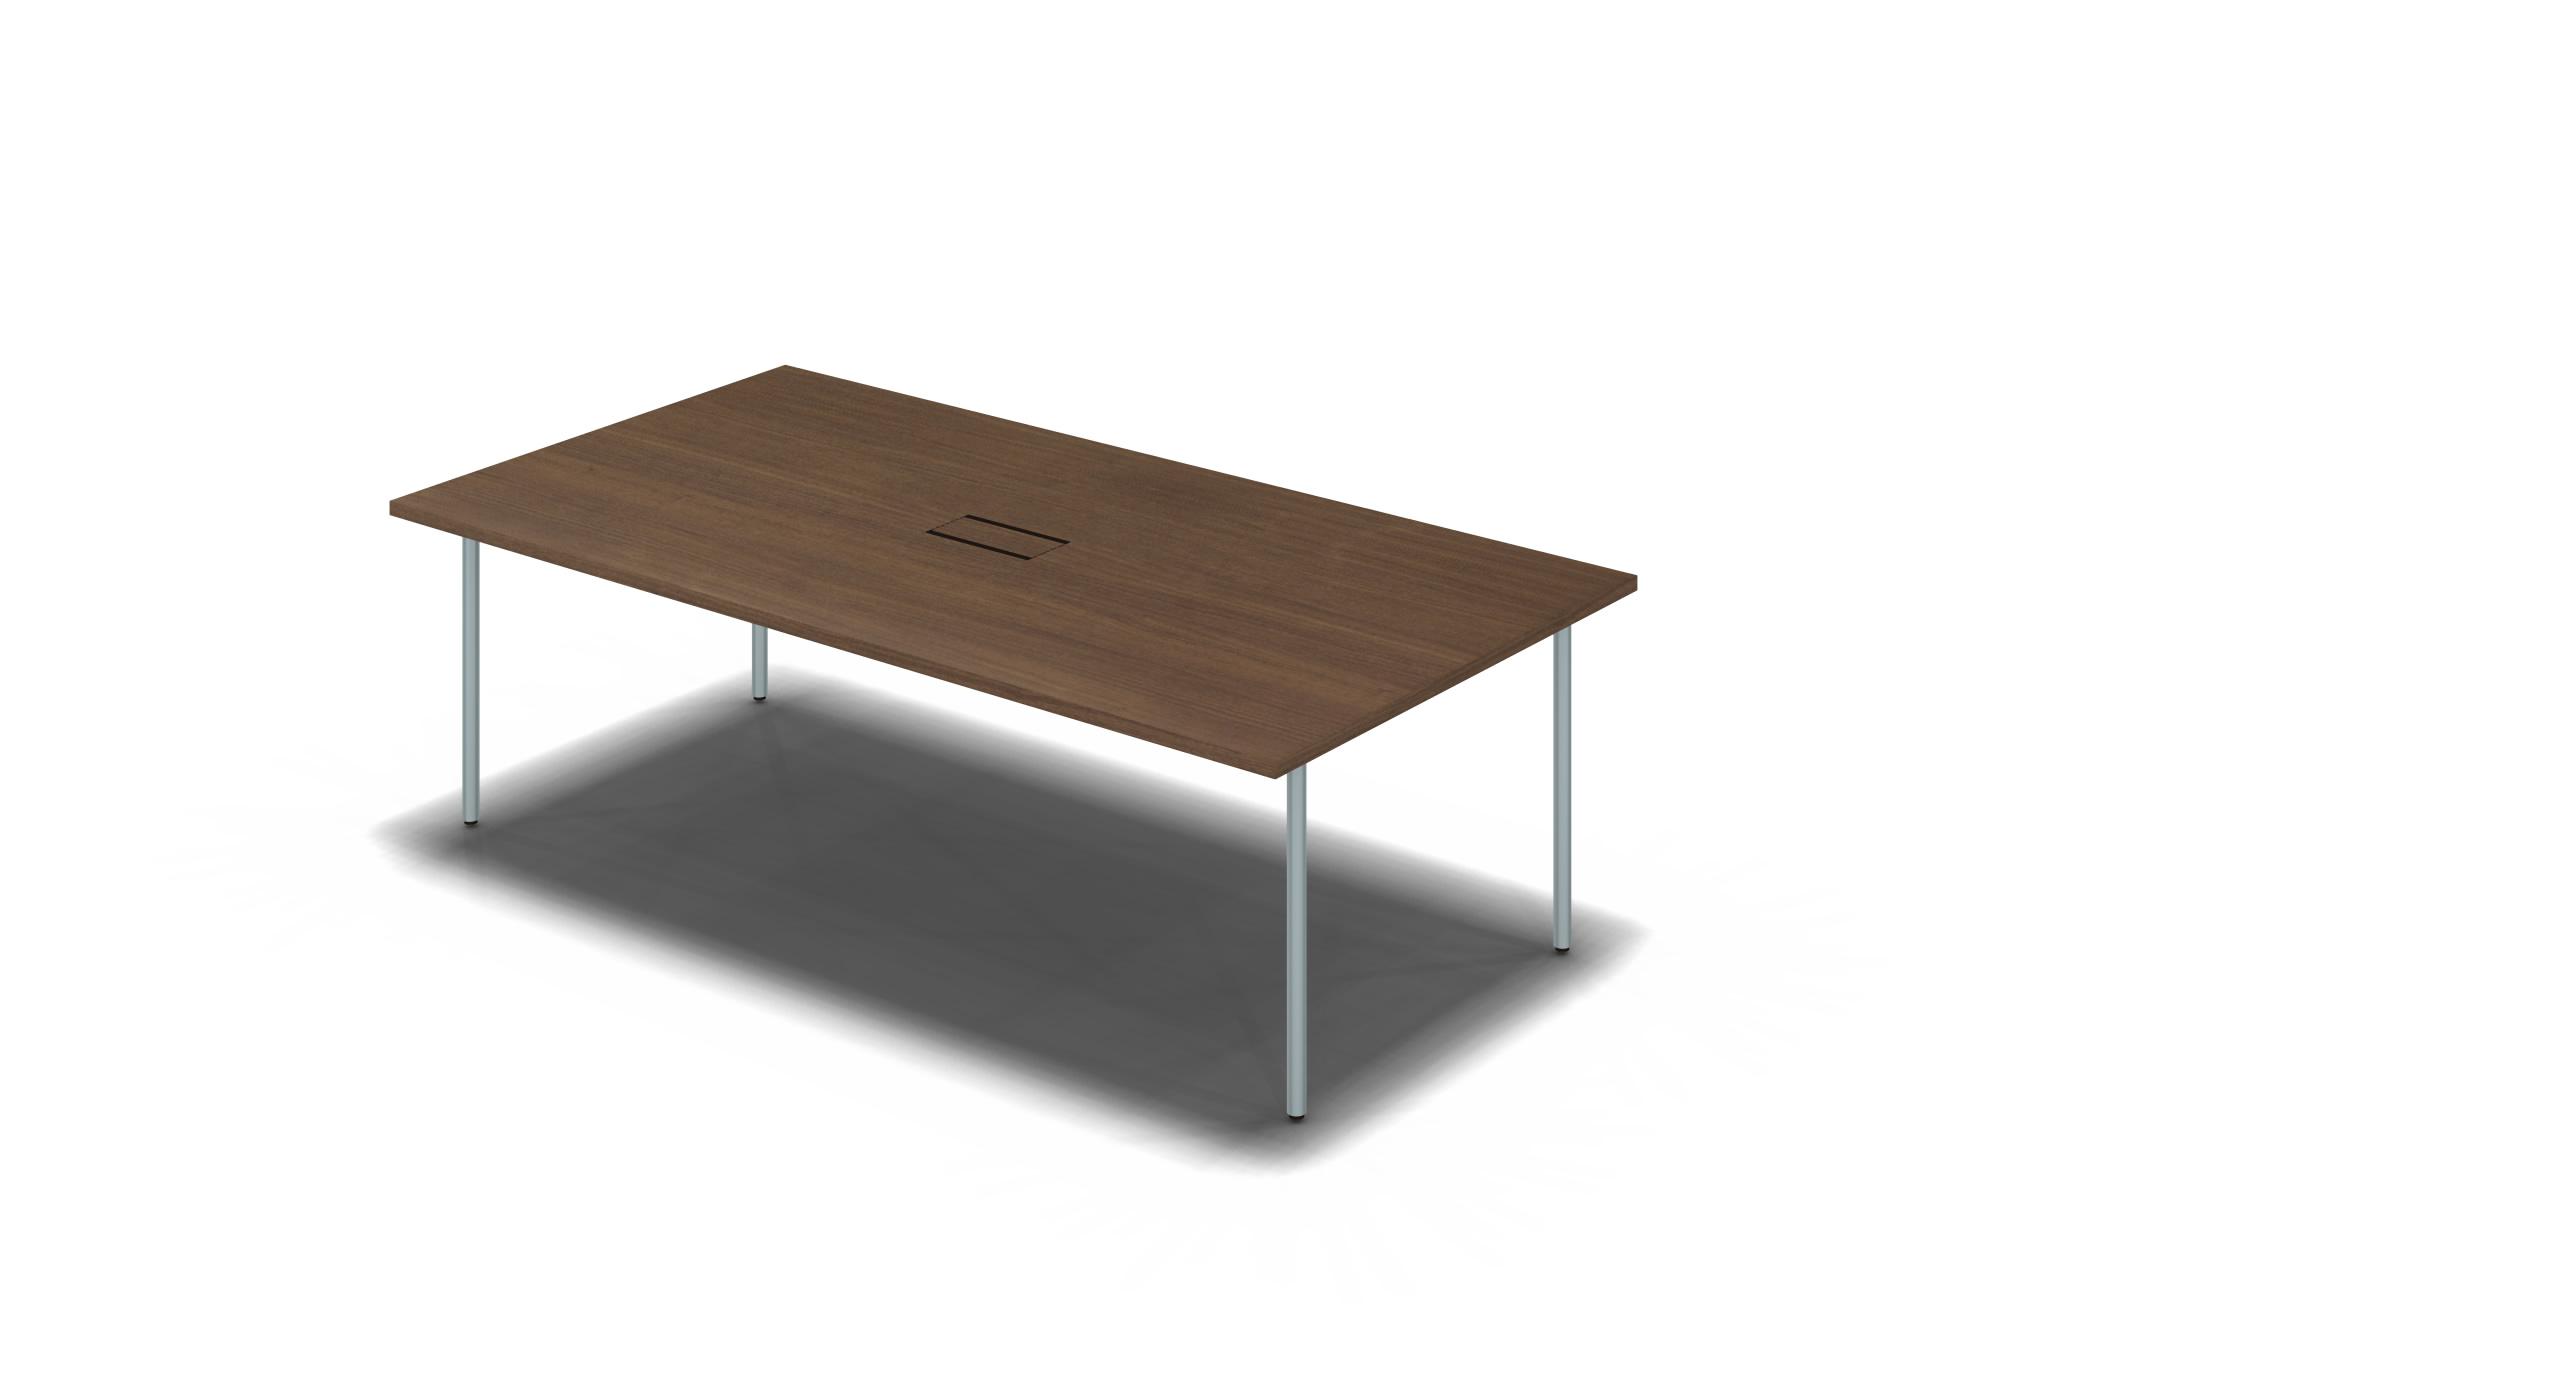 Table_Round_2100x1050_Silver_Walnut_withOption